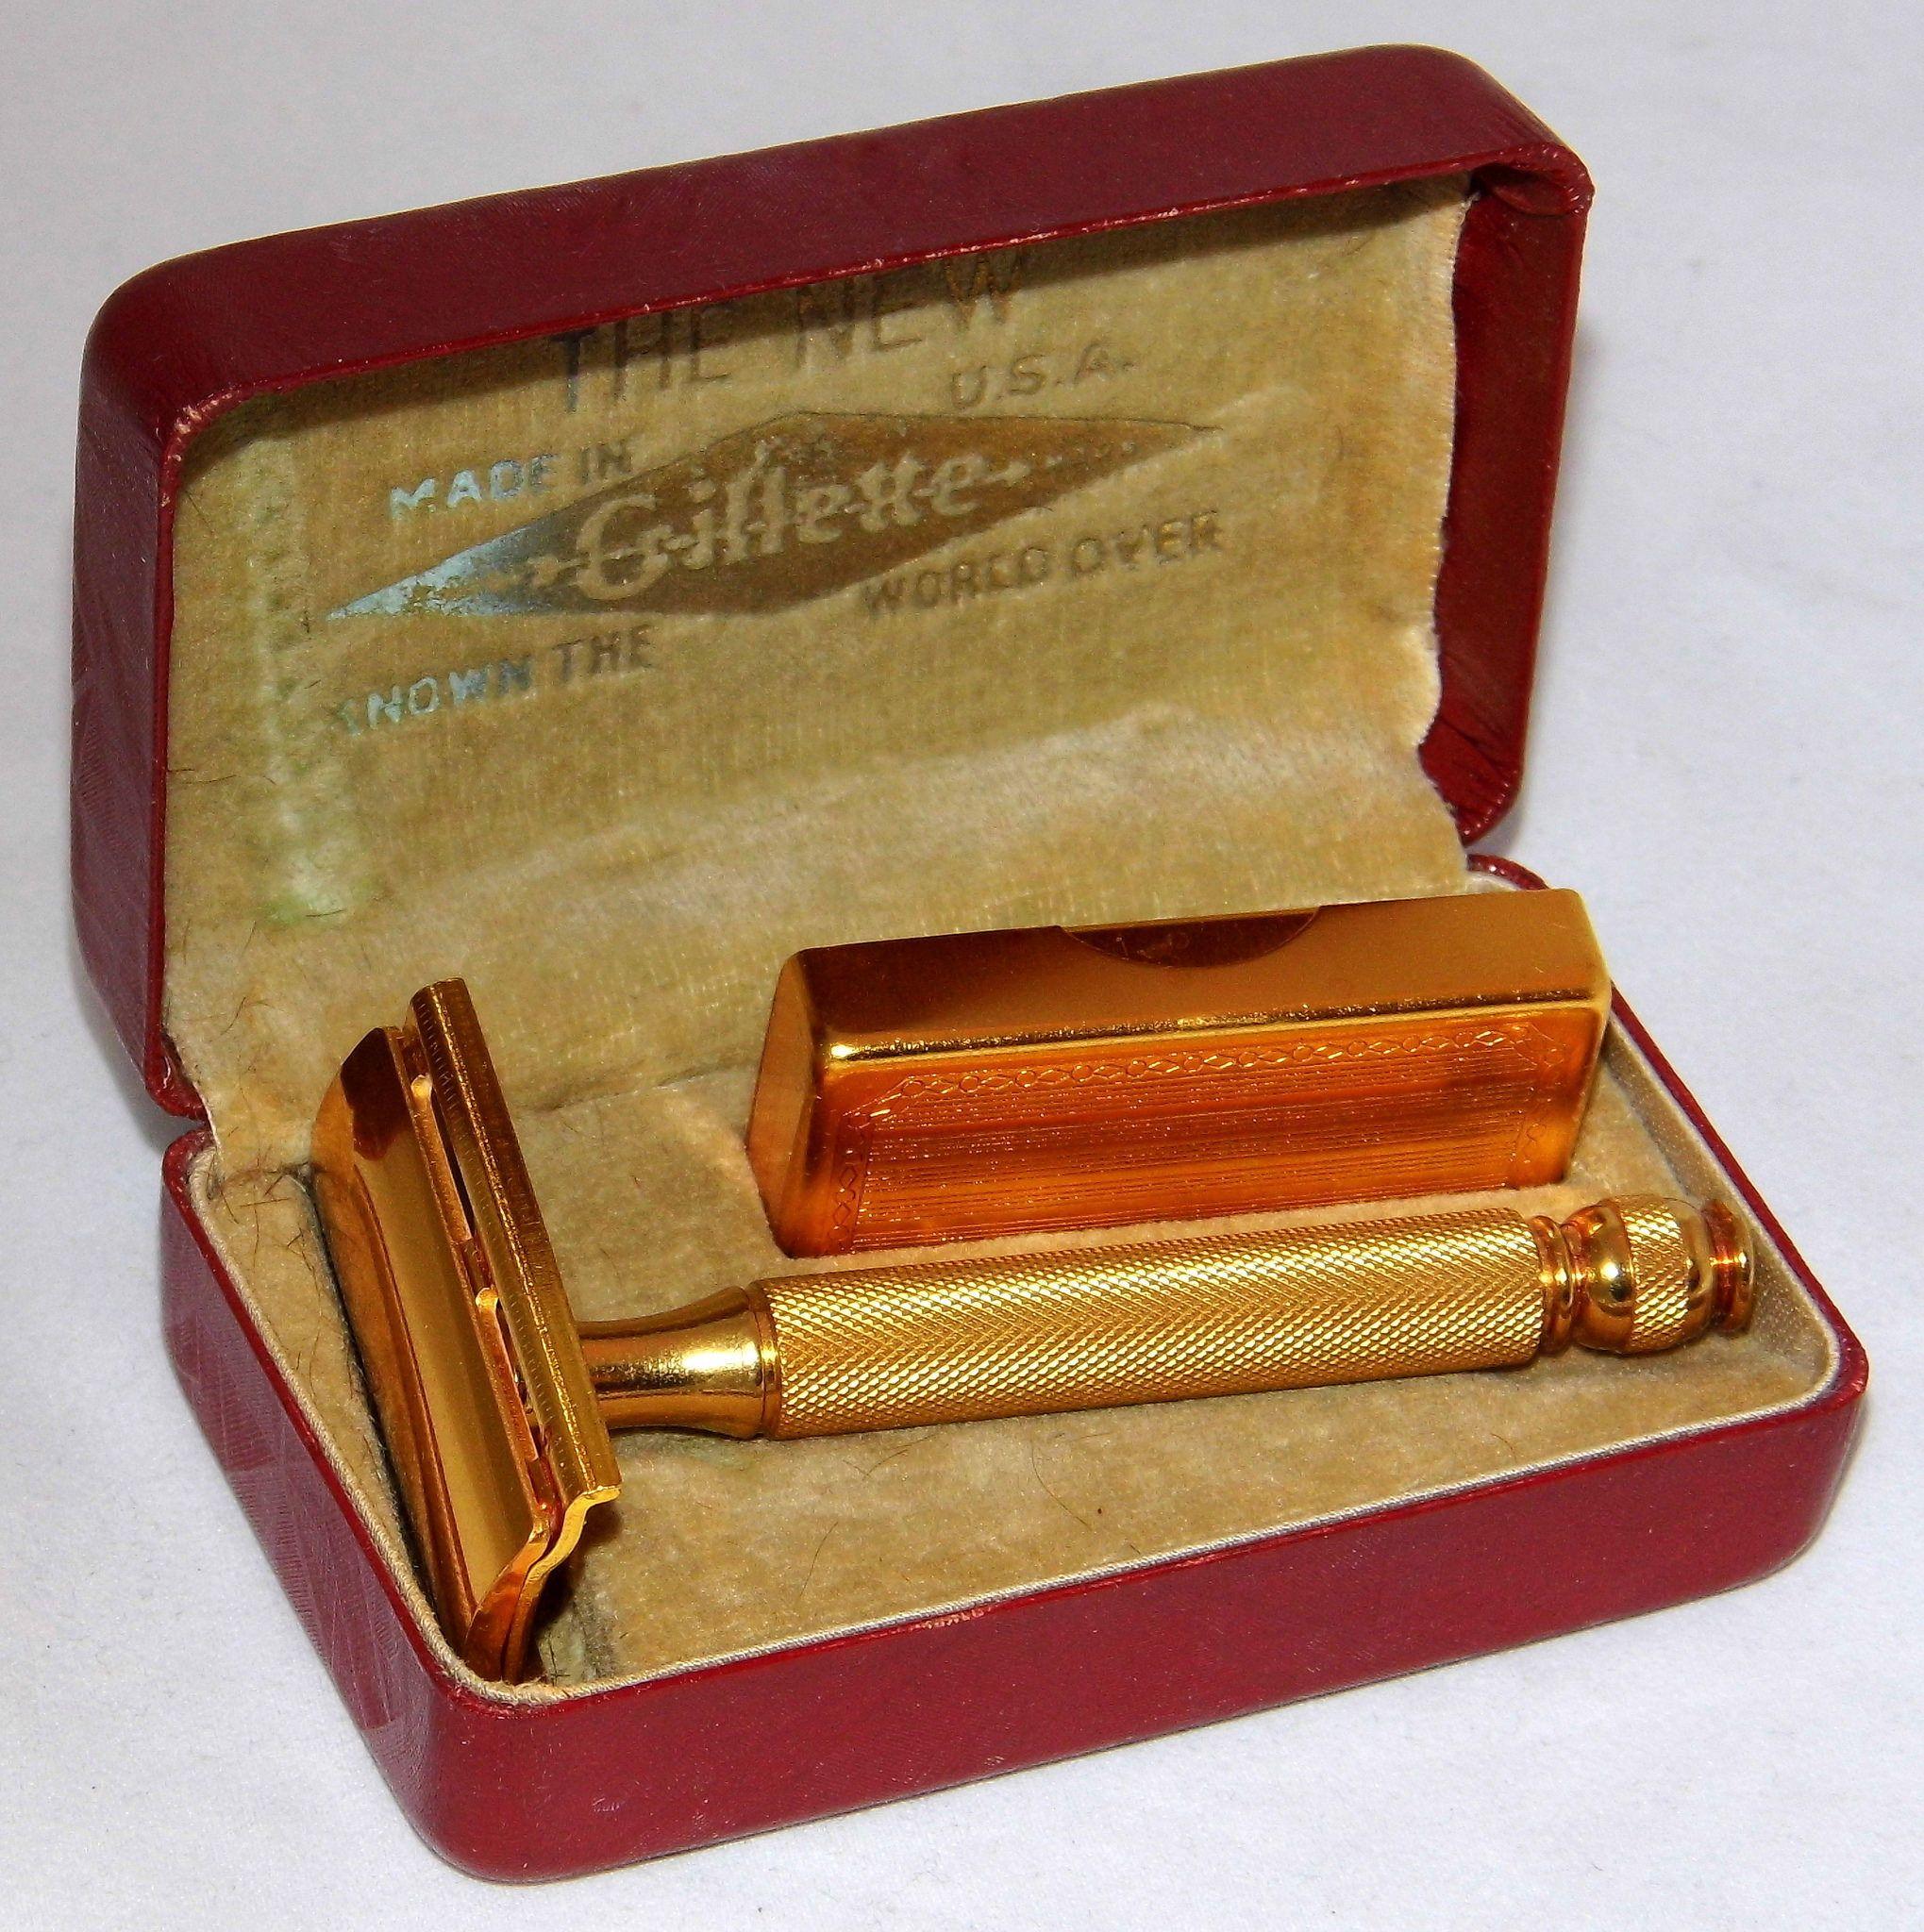 Vintage Gillette (The New) Safety Razor In Original Case